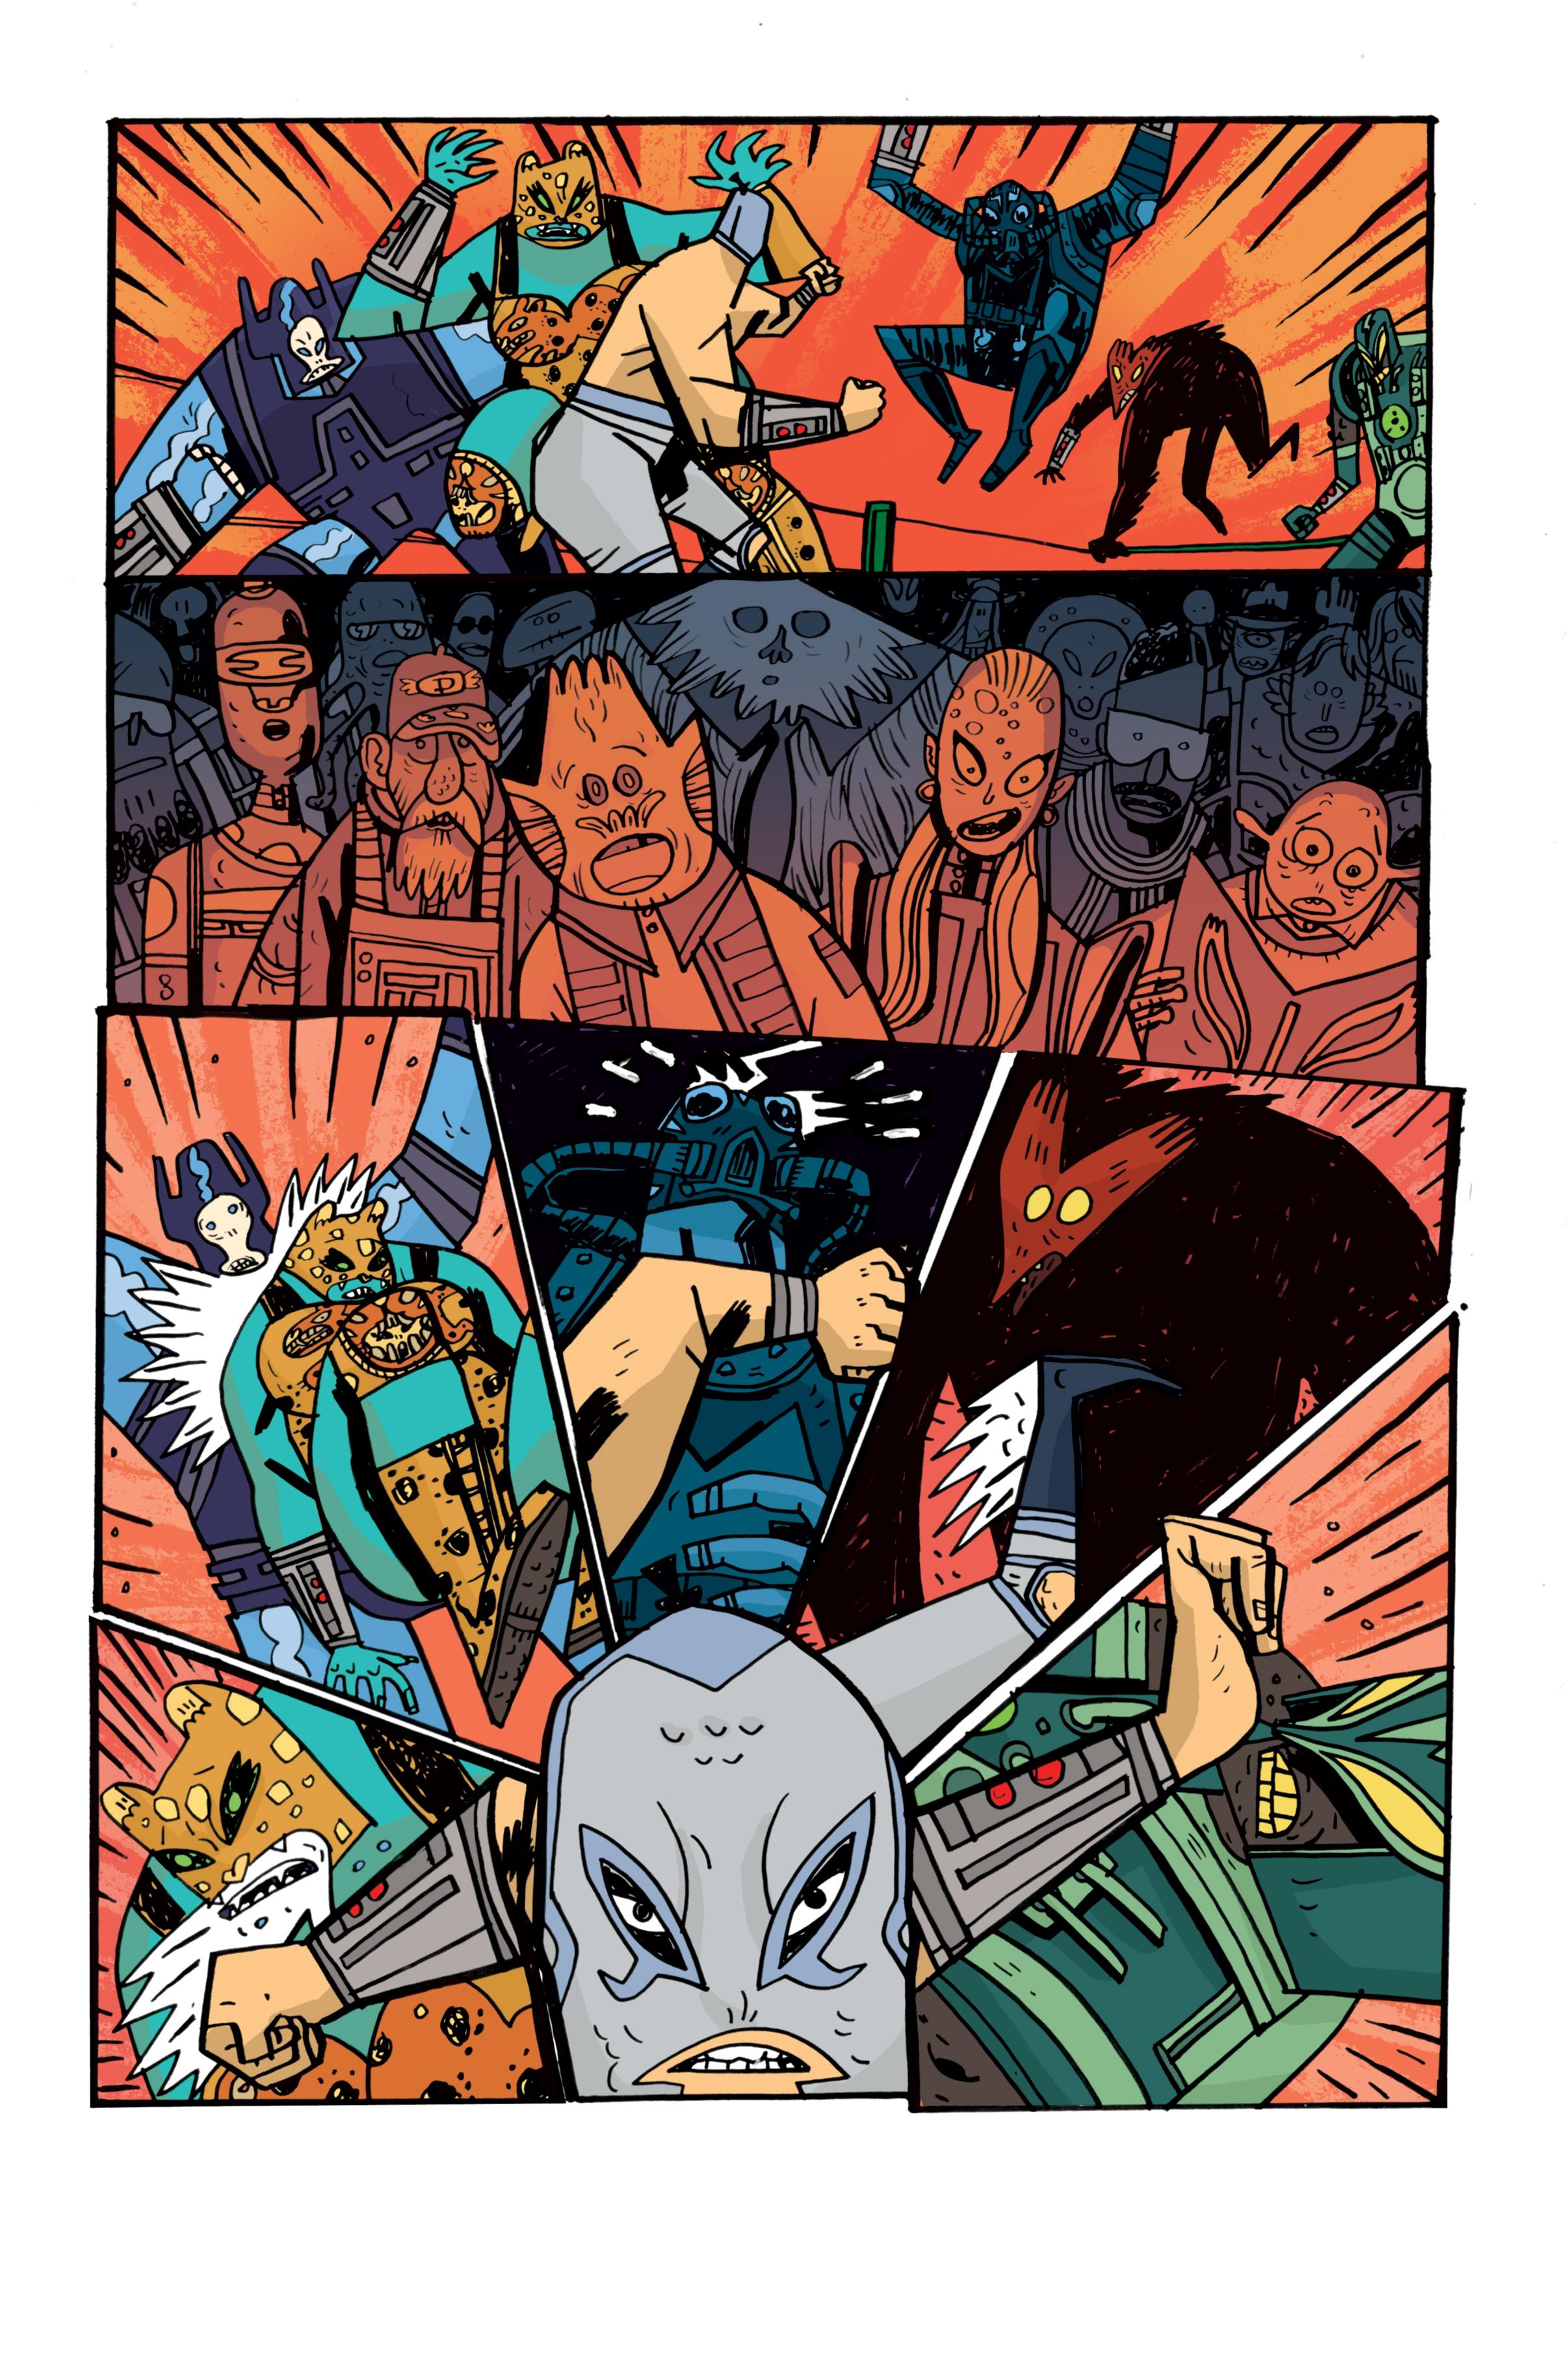 Colors for Samurai Jack: Quantum Jack #2 (IDW) – Art by Warwick Johnson Cadwell